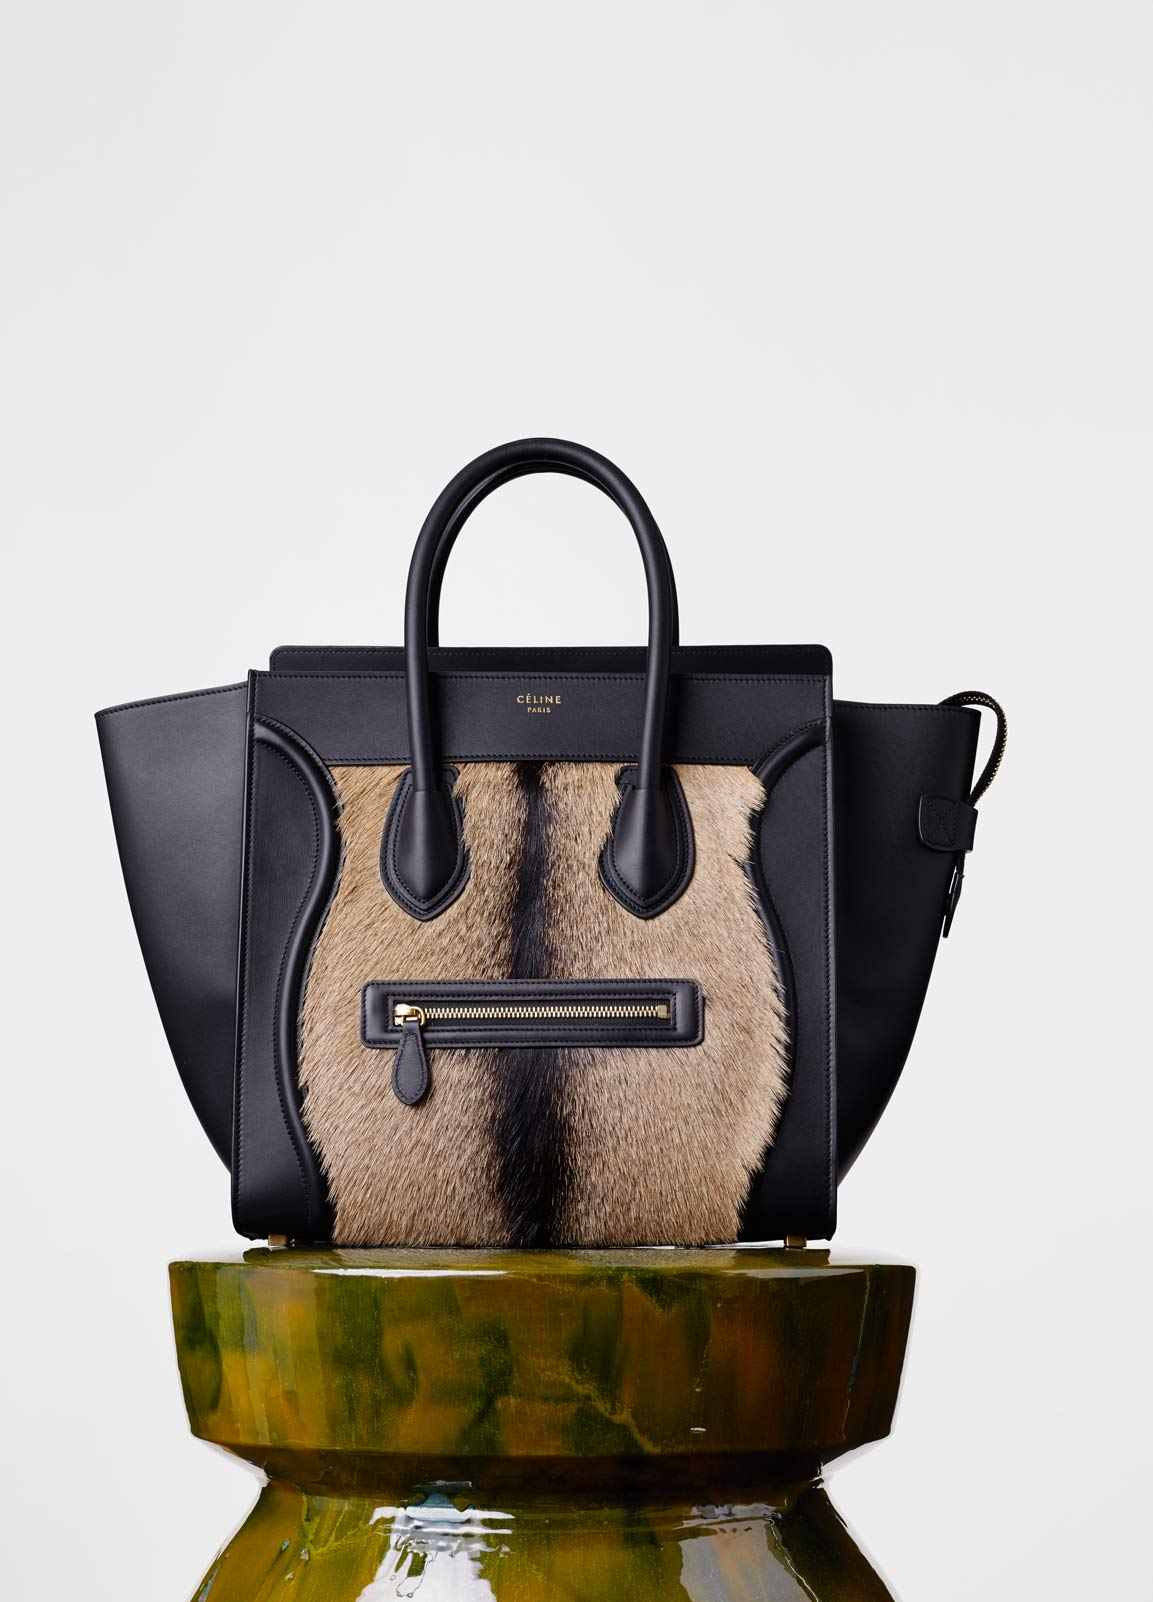 002b49ff58 celine fall winter 2015 bags handbags purses season collection